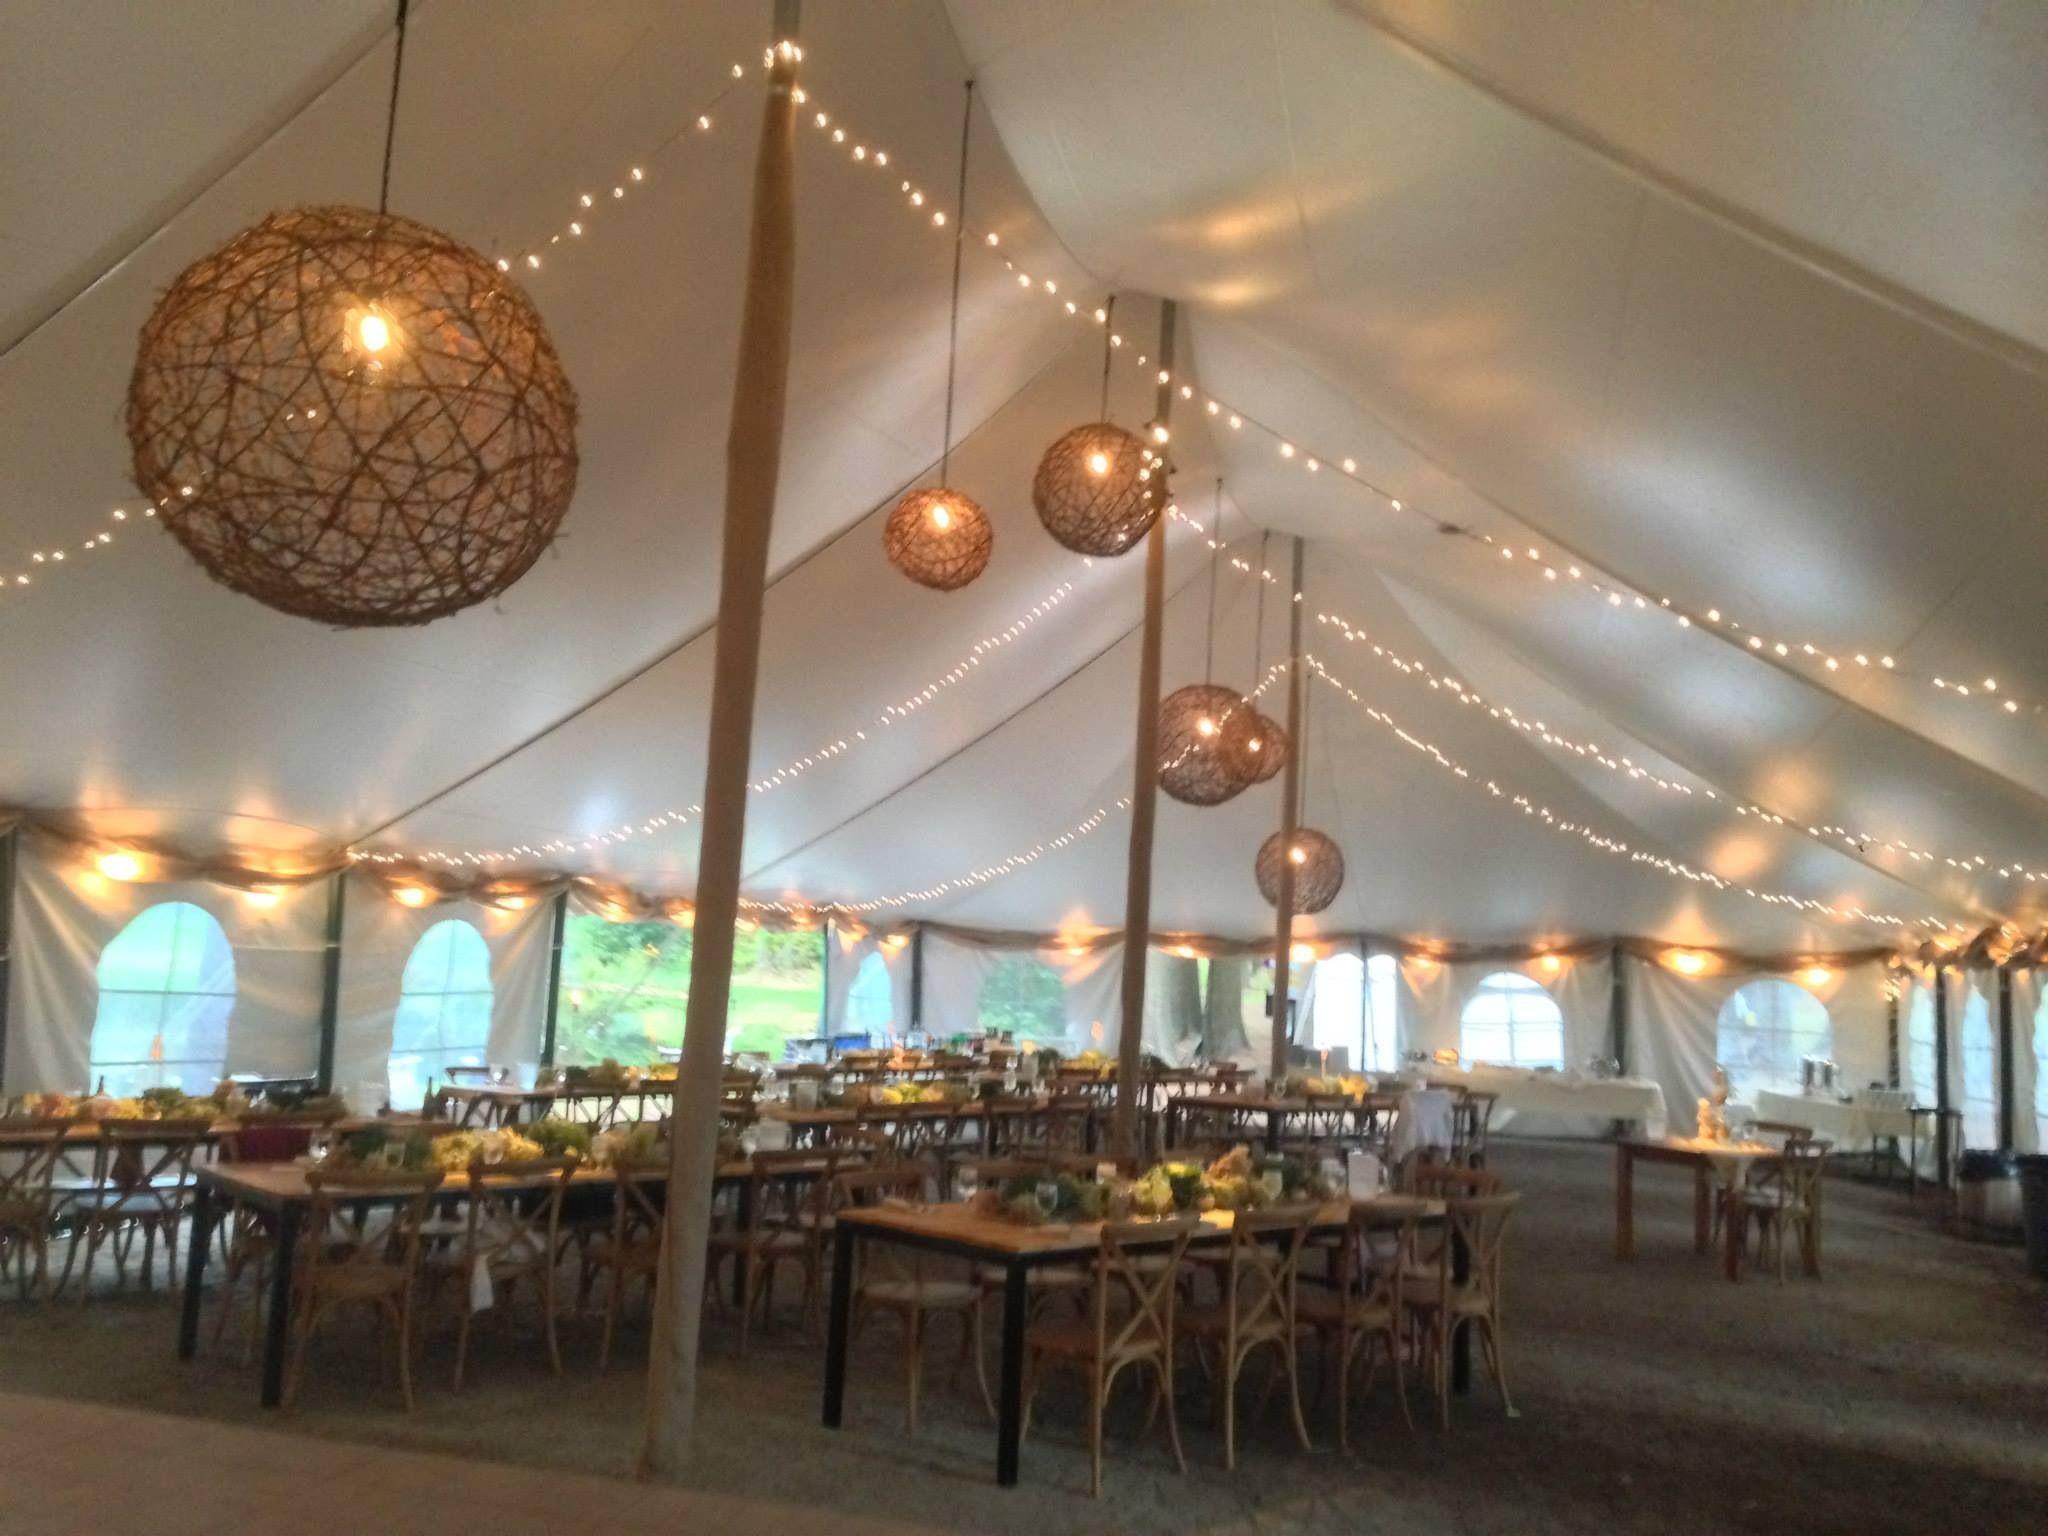 Smolak Farms Wedding Grapevine Spheres New England